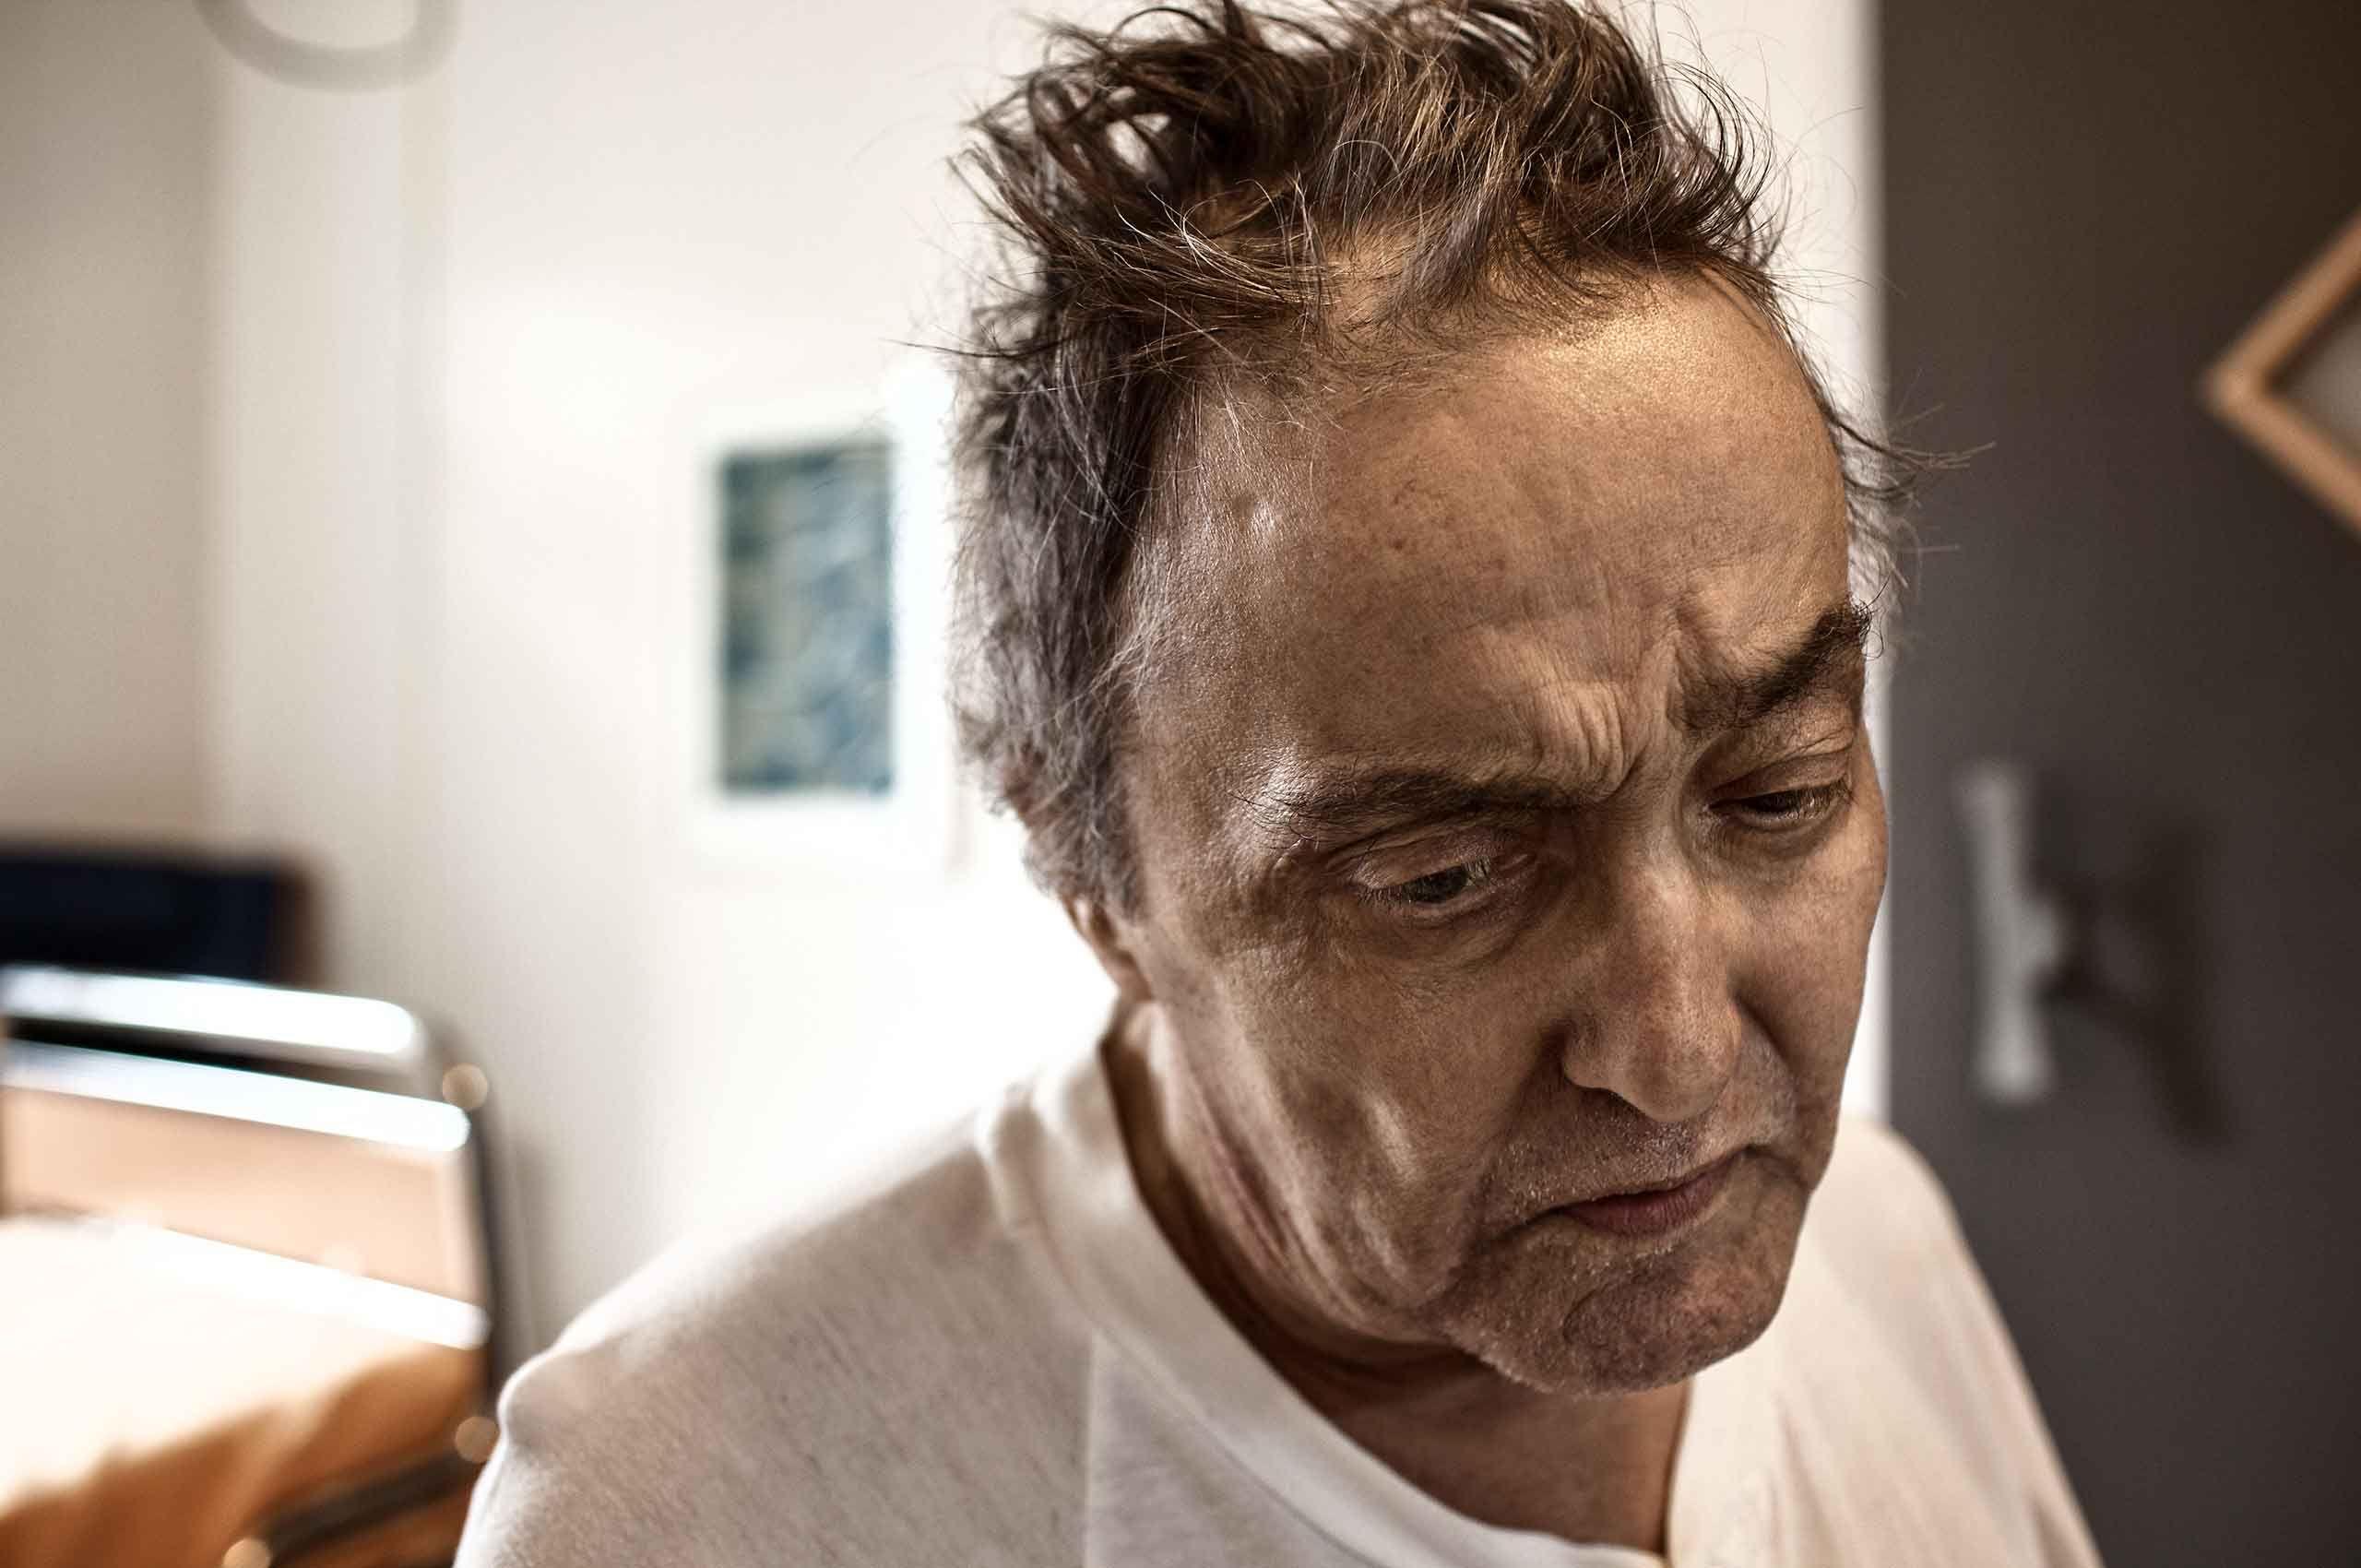 Dad-at-the-hospital-by-HenrikOlundPhotography.jpg